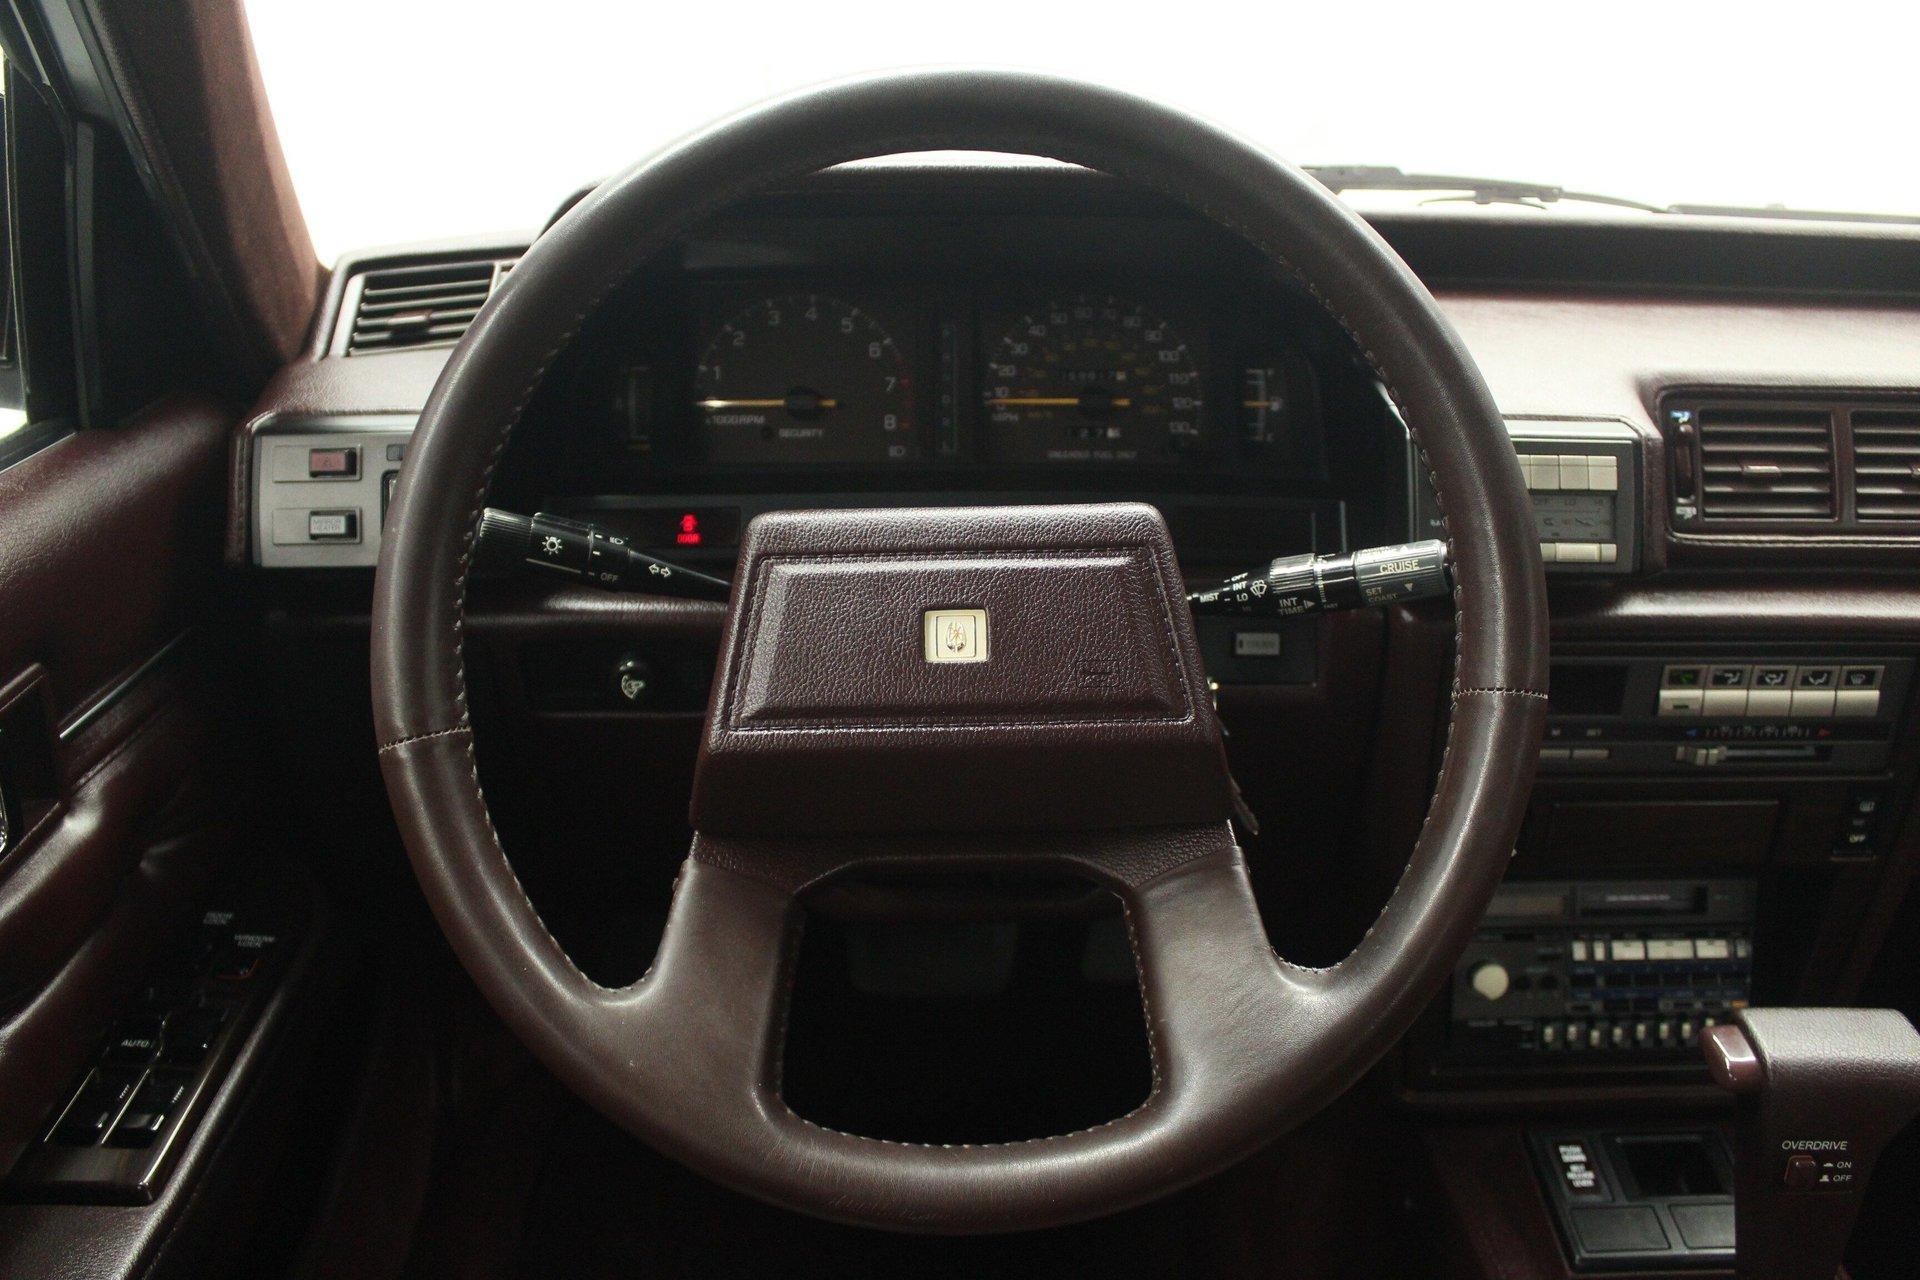 1986 Toyota Cressida